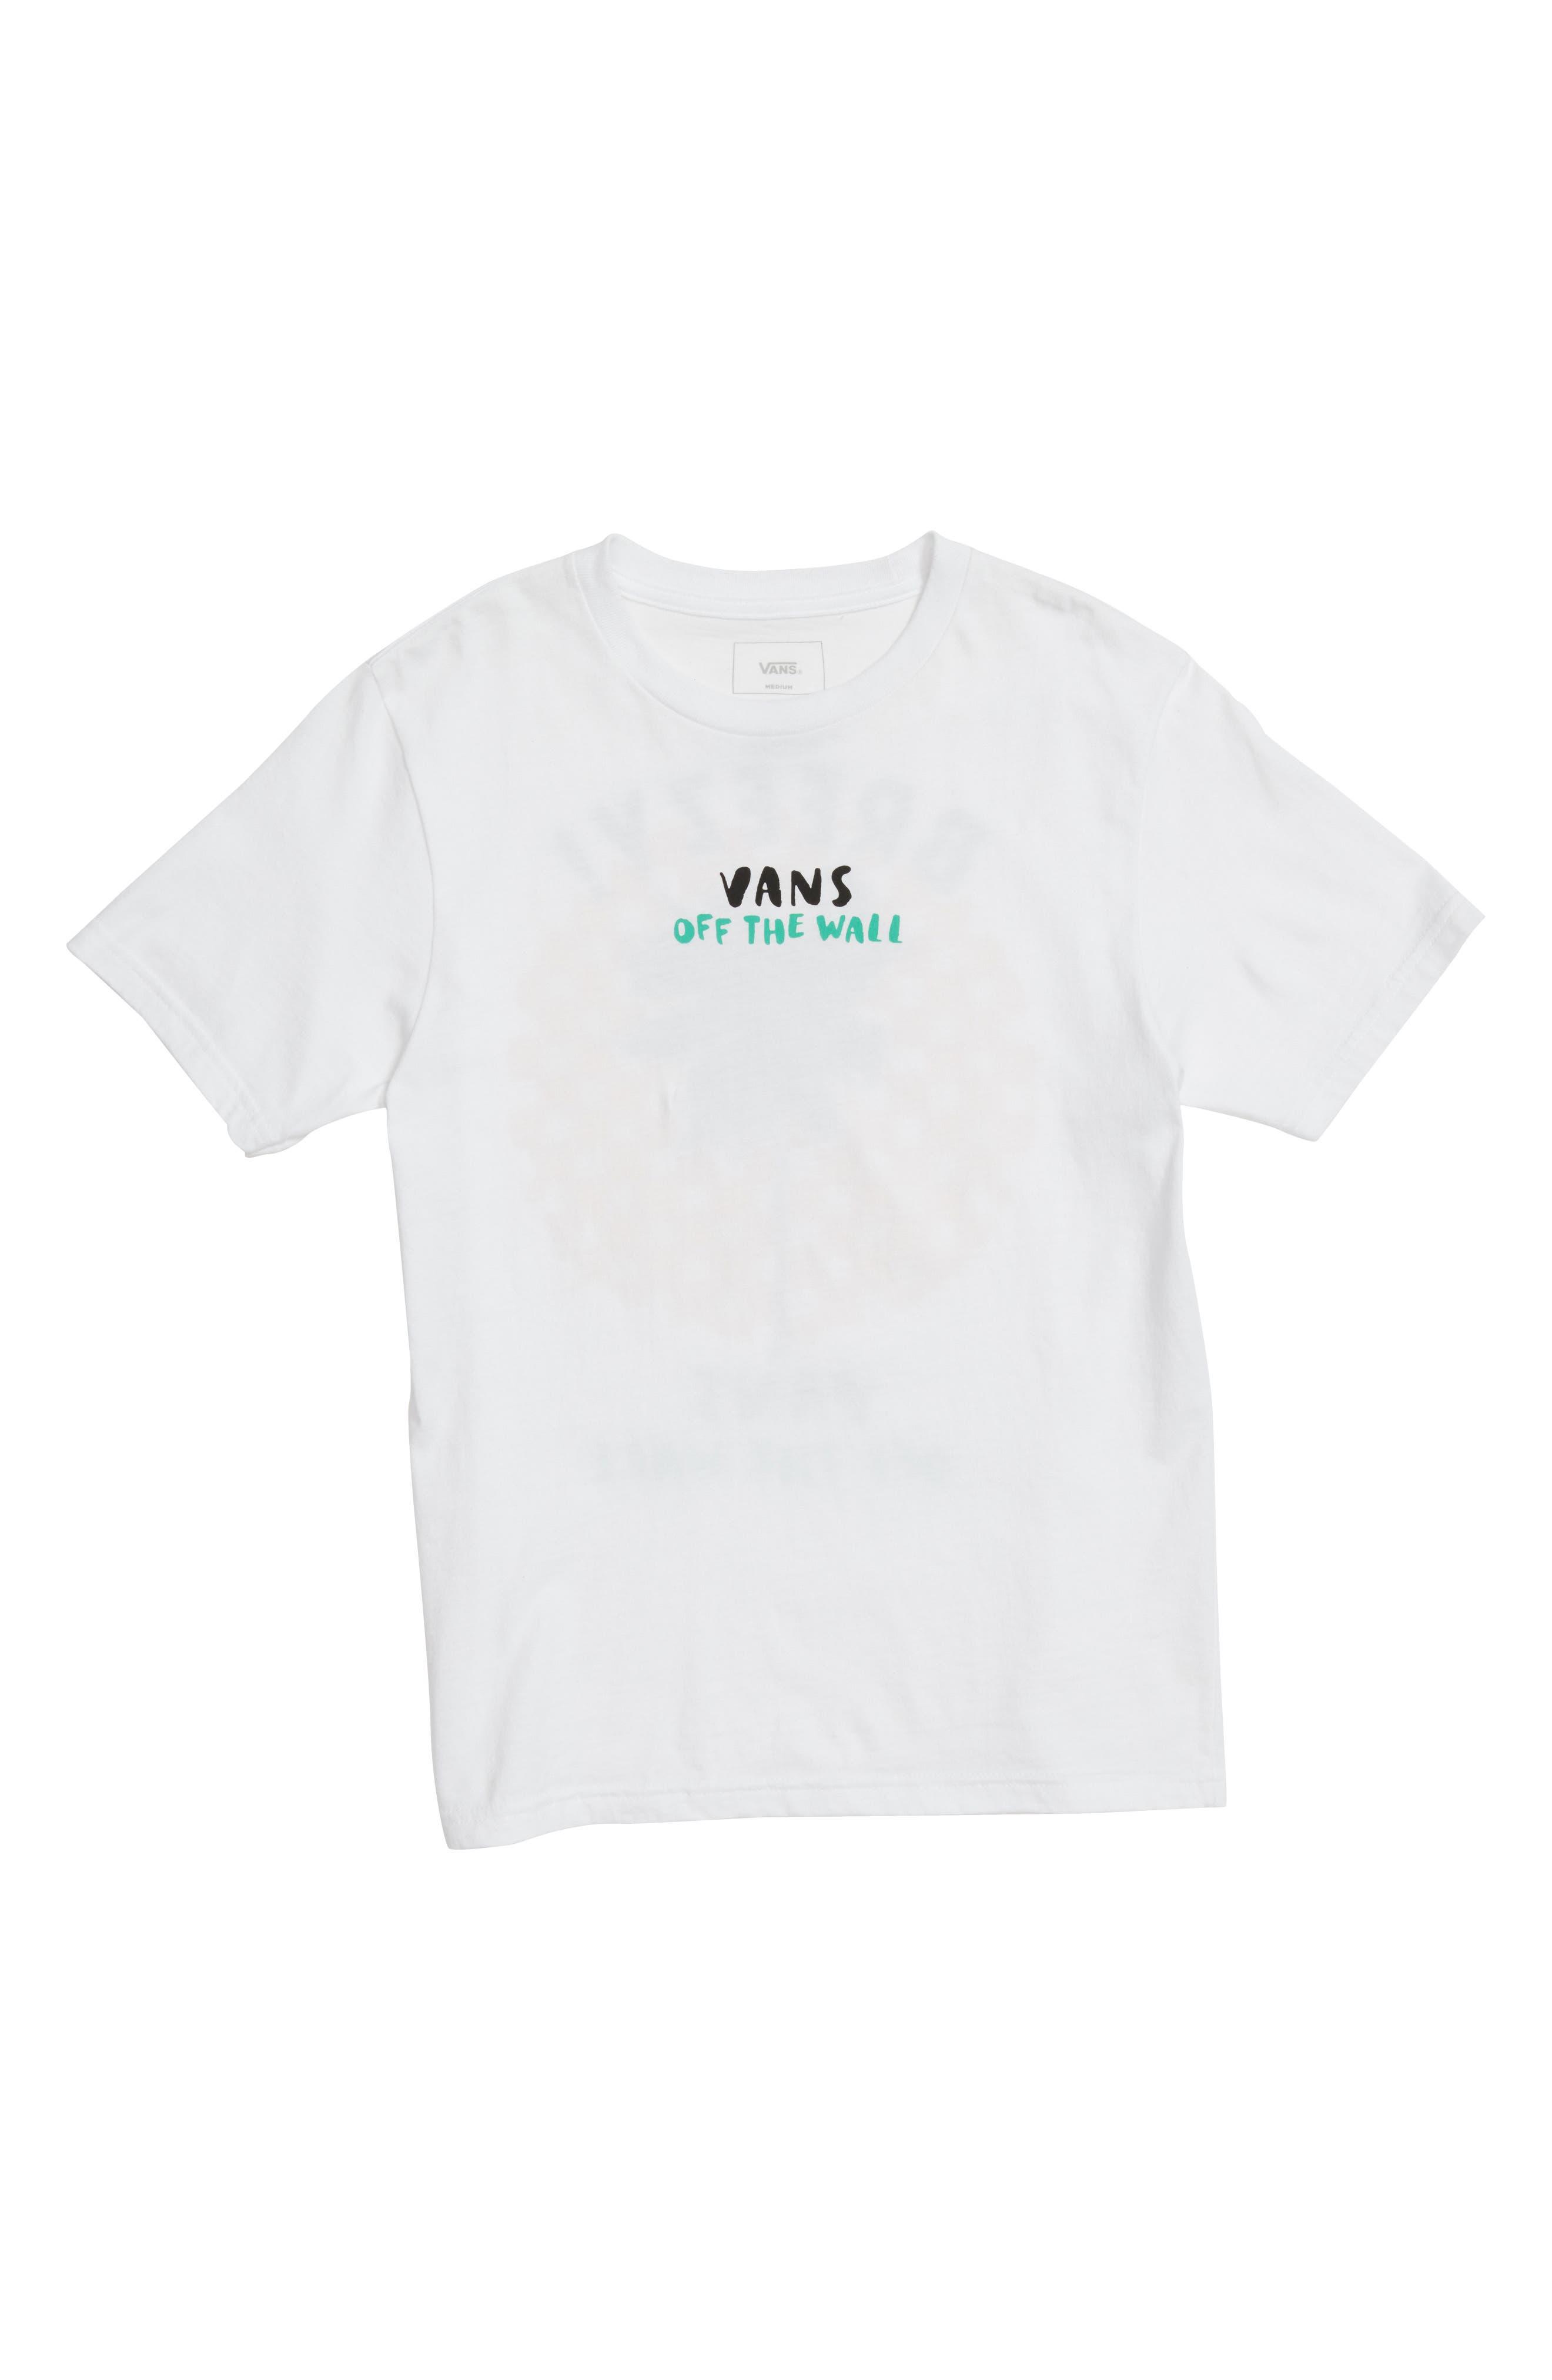 VANS,                             Stay Breezy Graphic T-Shirt,                             Main thumbnail 1, color,                             100